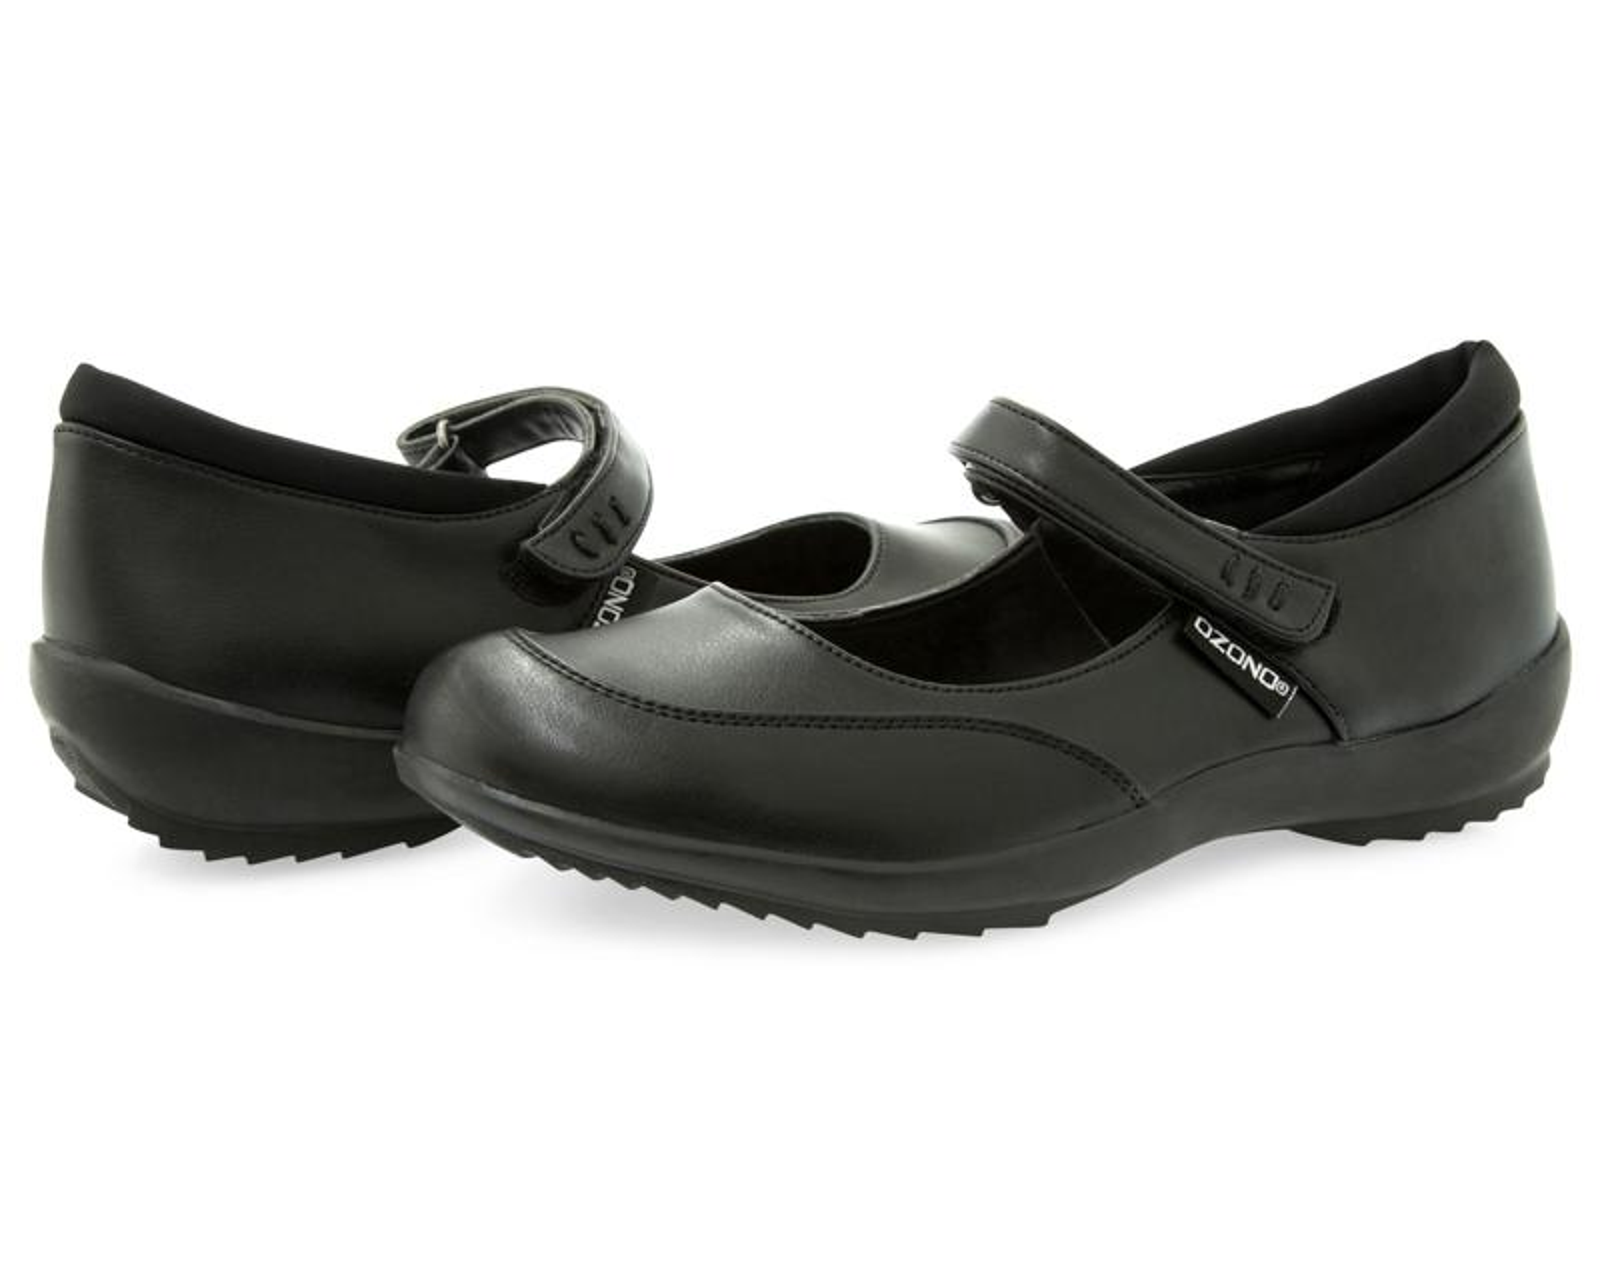 32c6ae63 Zapato escolar en línea para niñas | Coppel.com